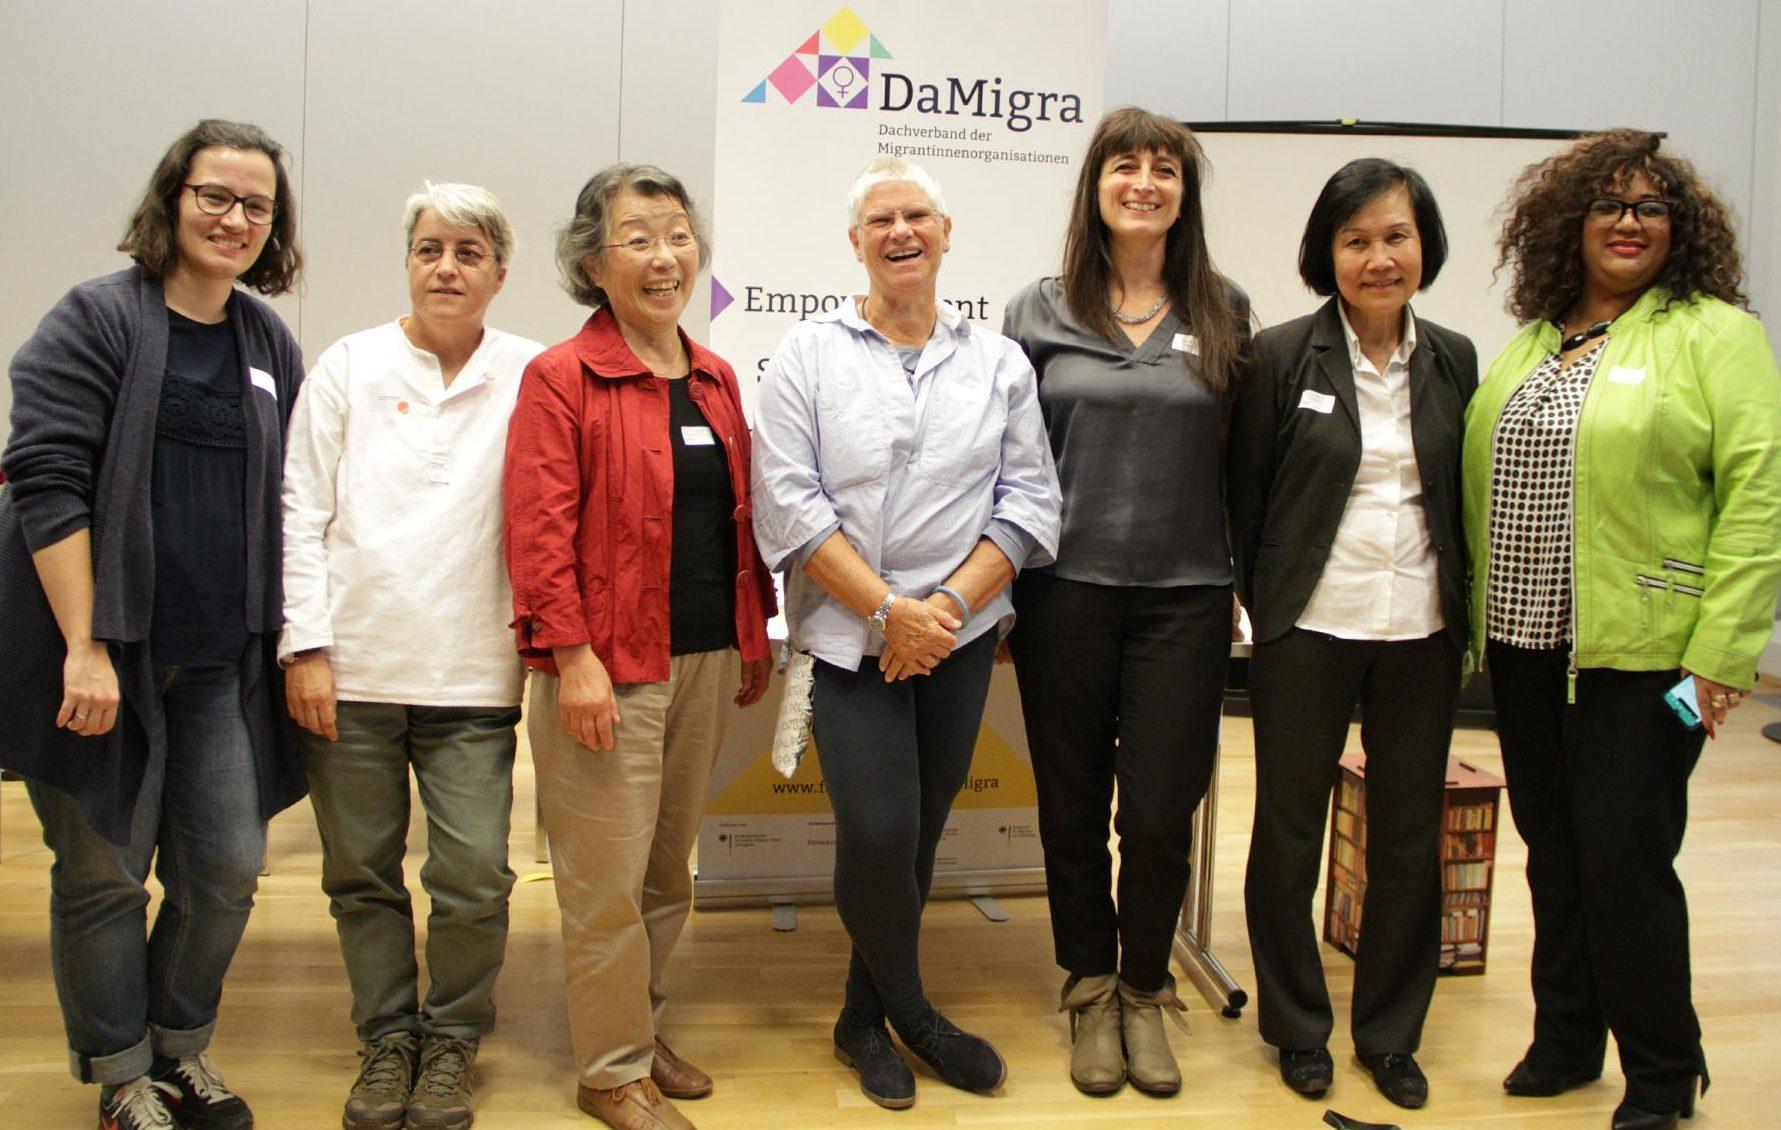 damigra_header_bild